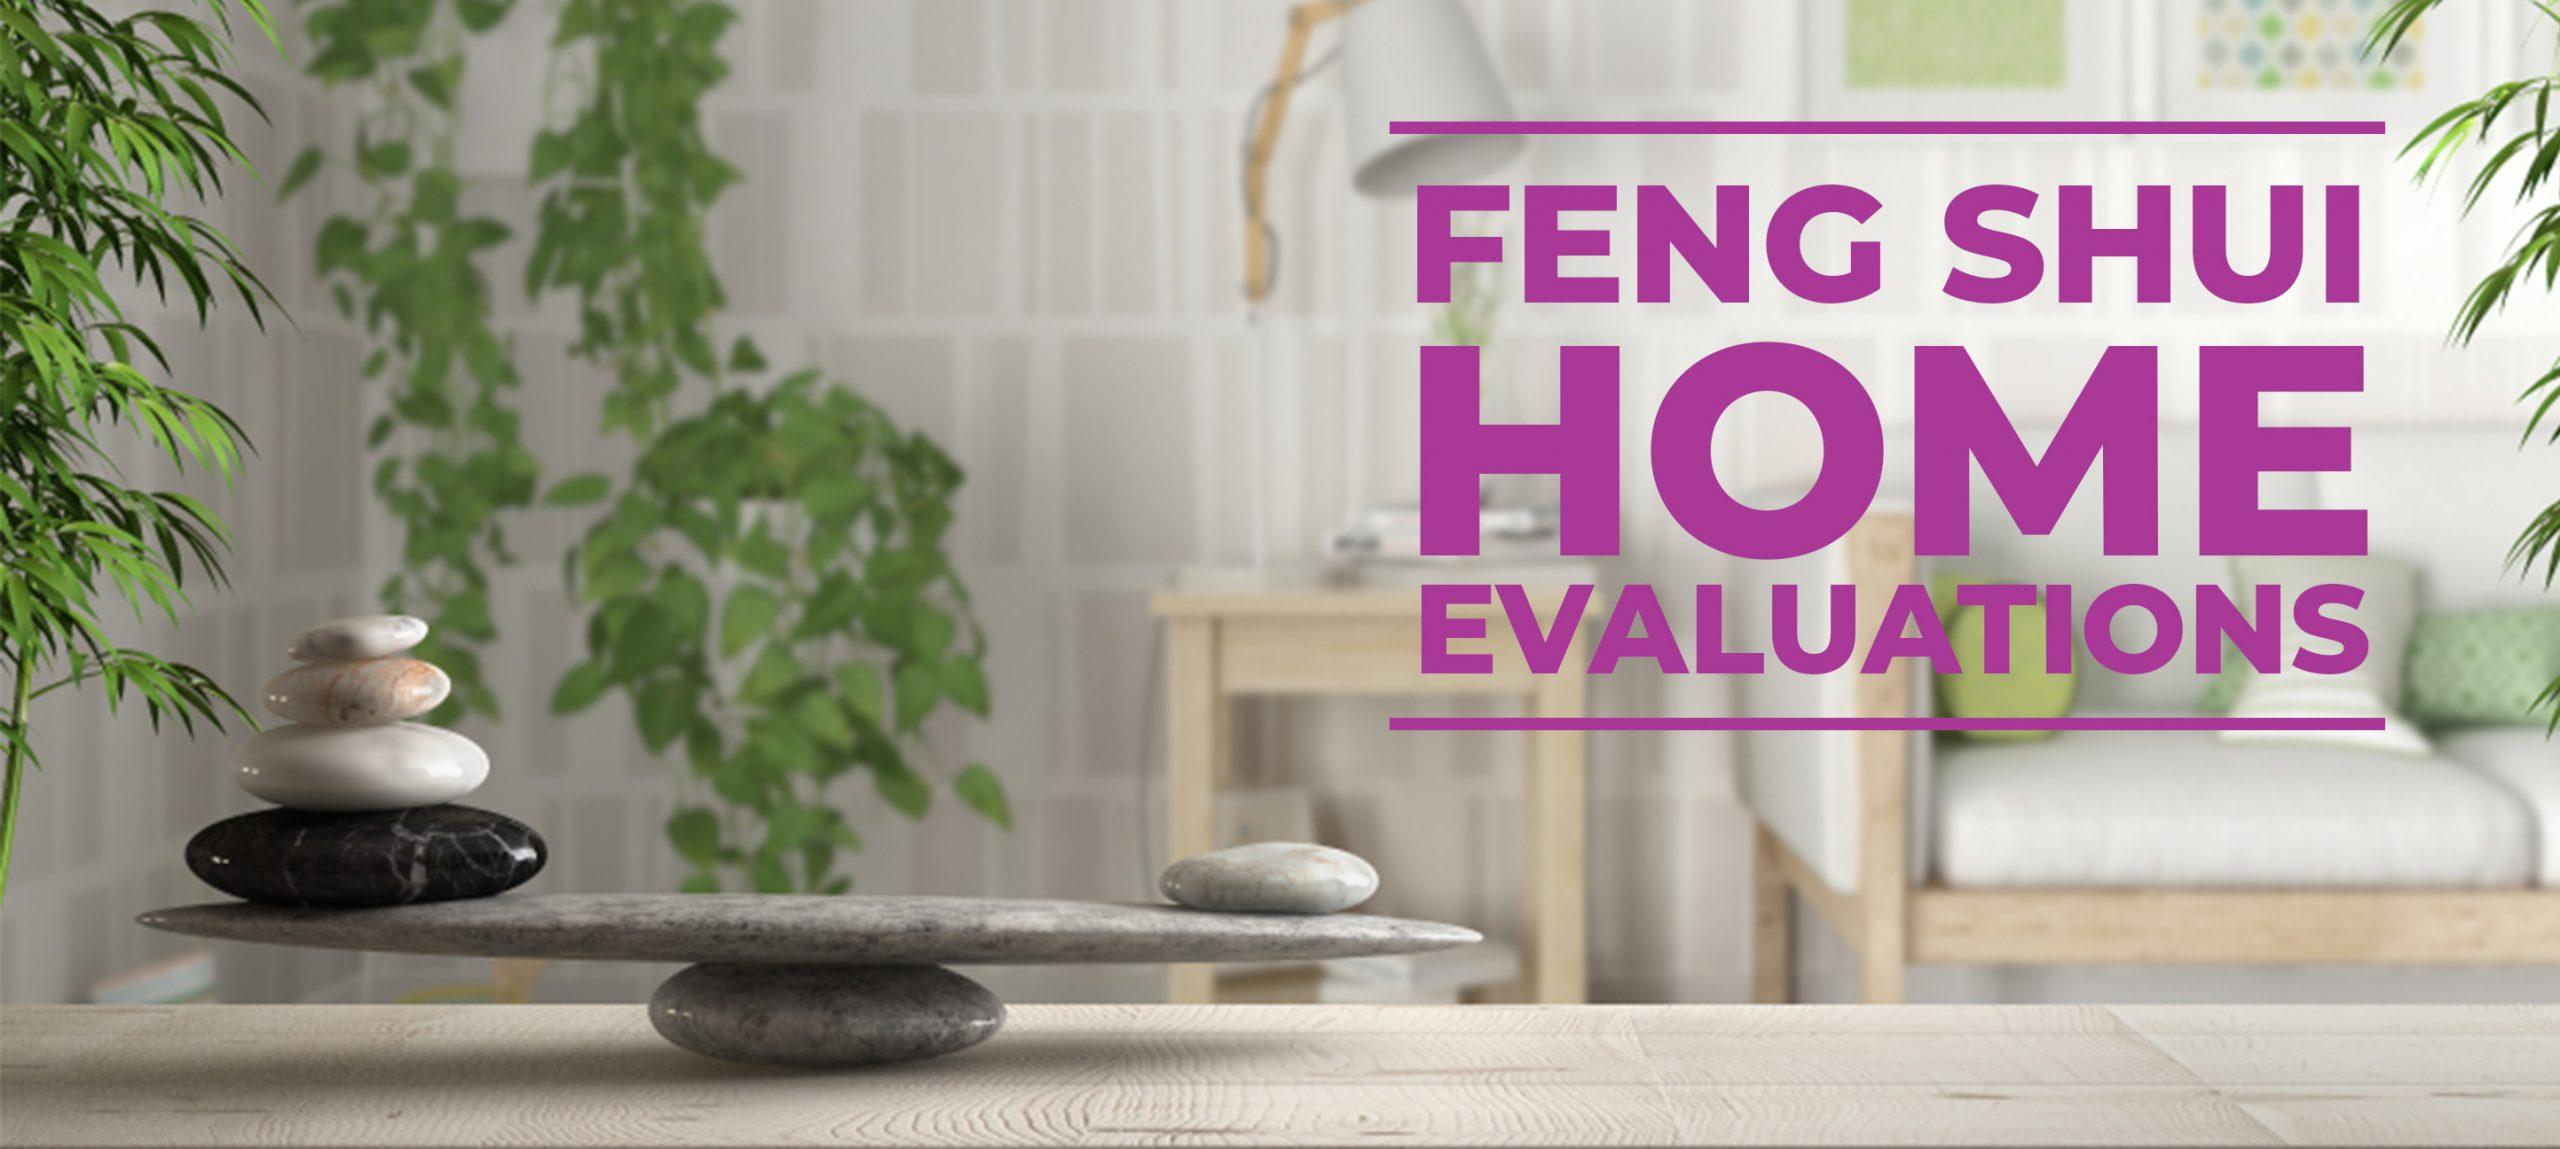 Feng shui home evaluation